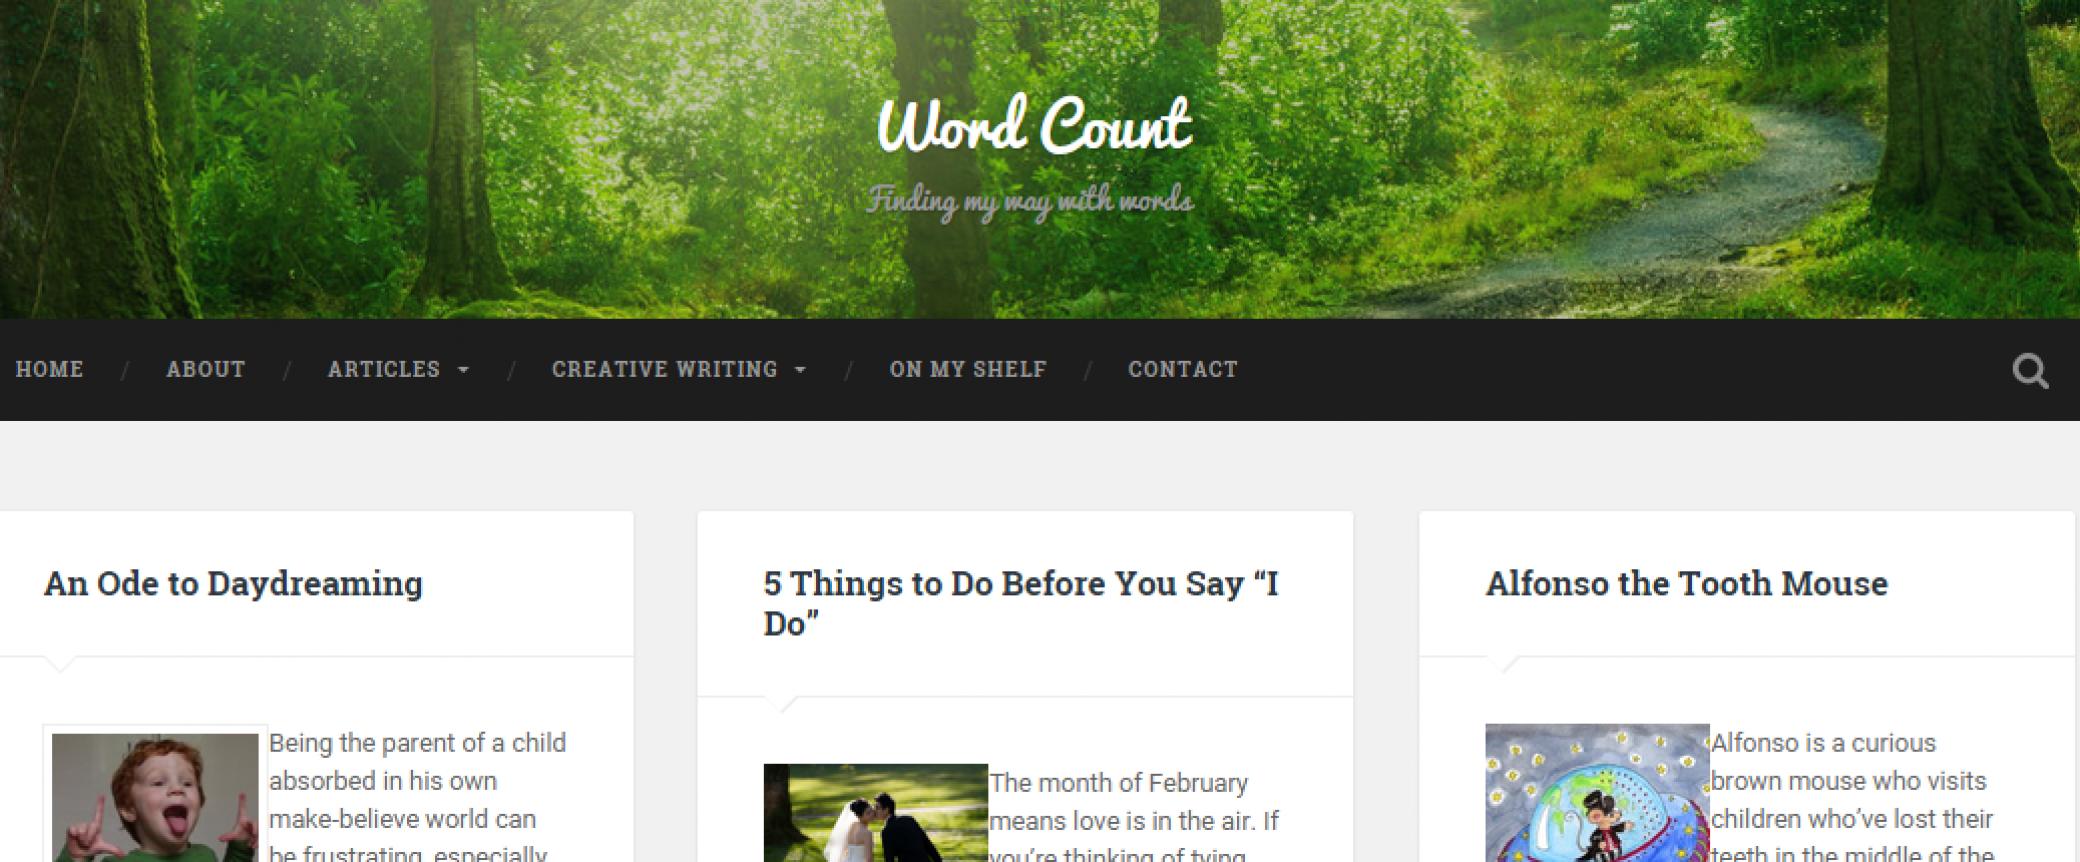 Word Count Wordpress Portfolio Website